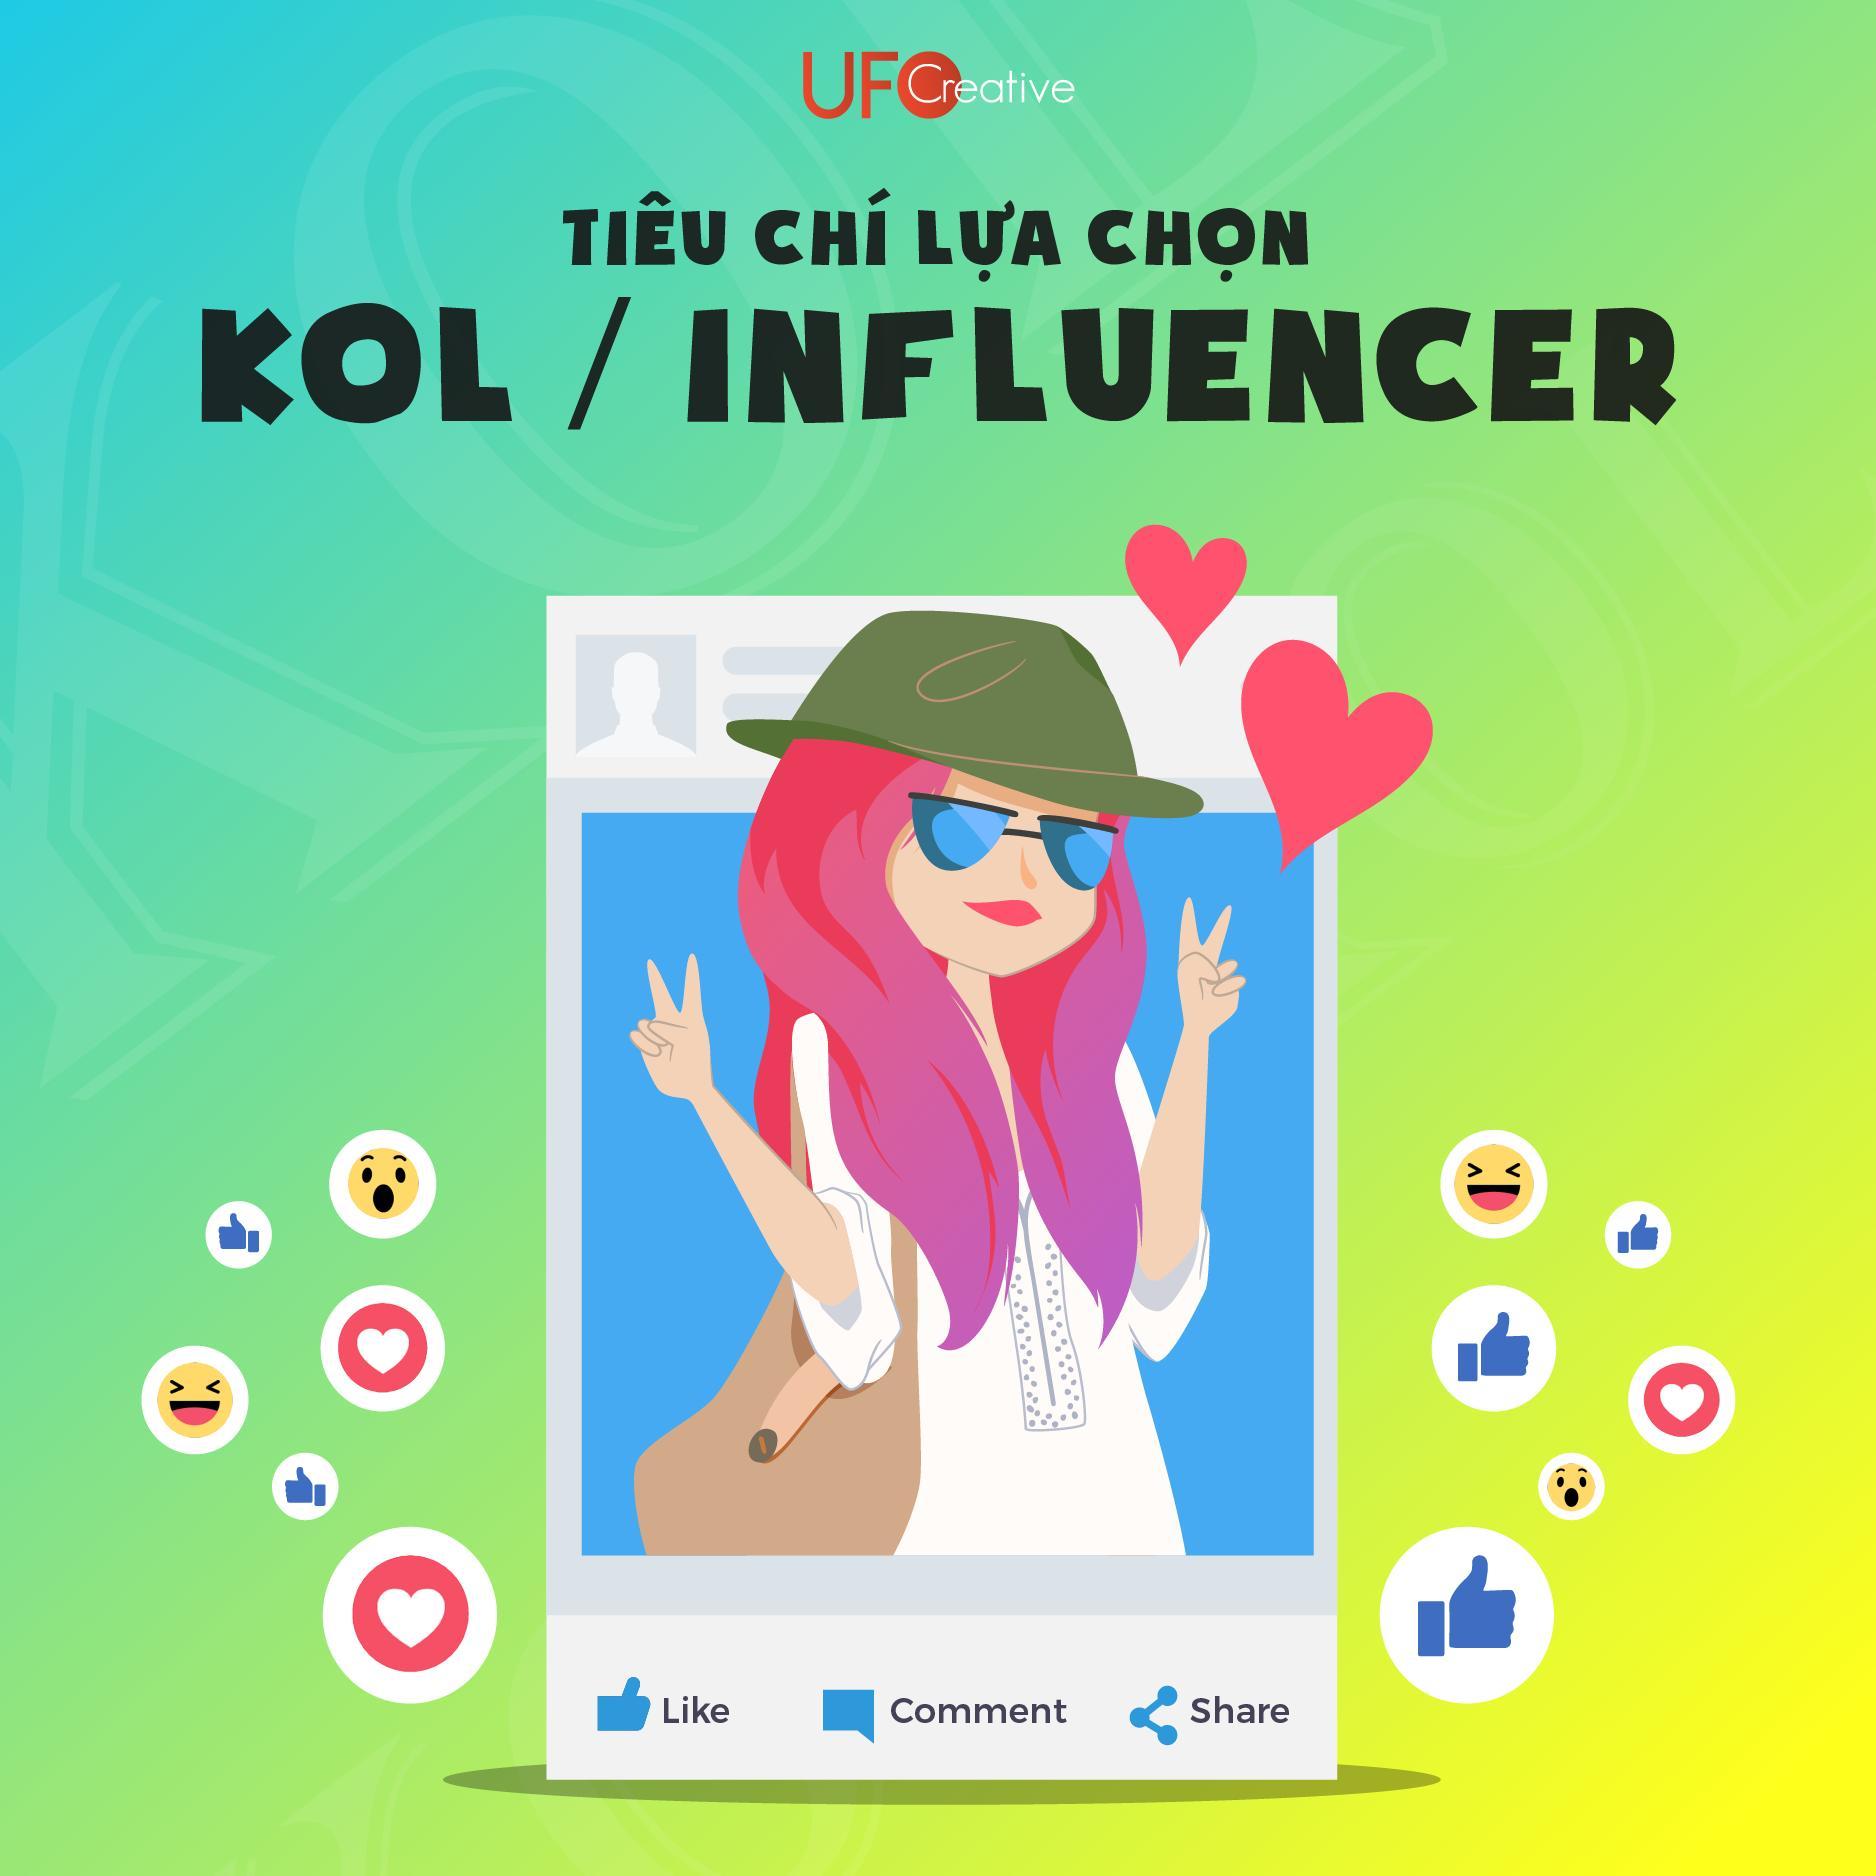 Lựa chọn KOL/ Influencer